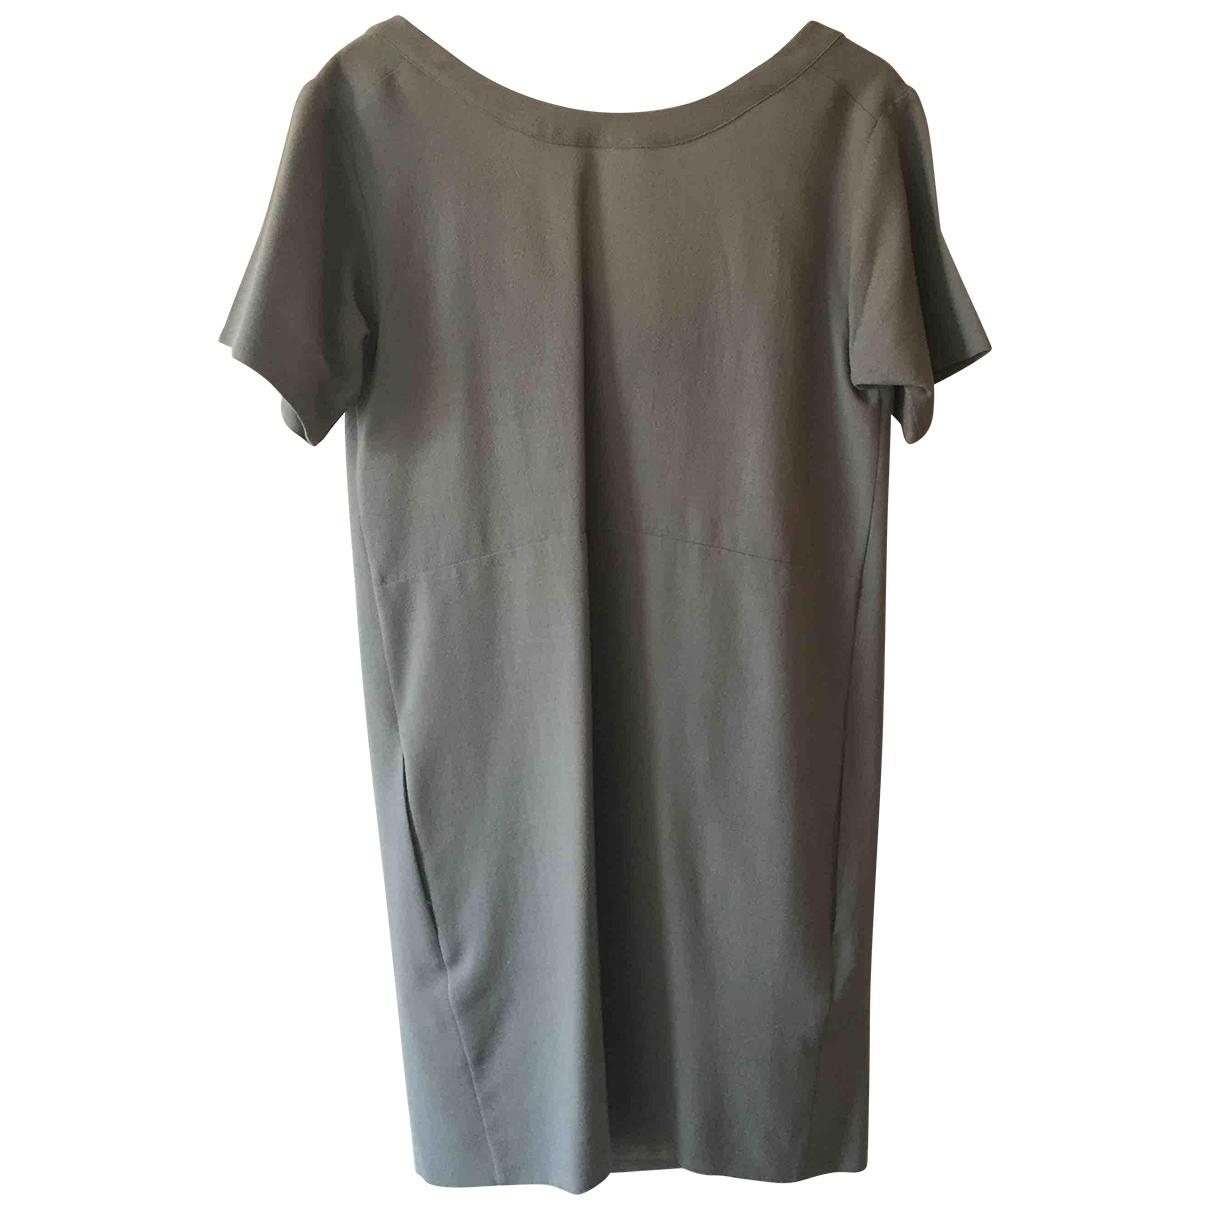 Chloé \N Green Wool dress for Women 38 FR